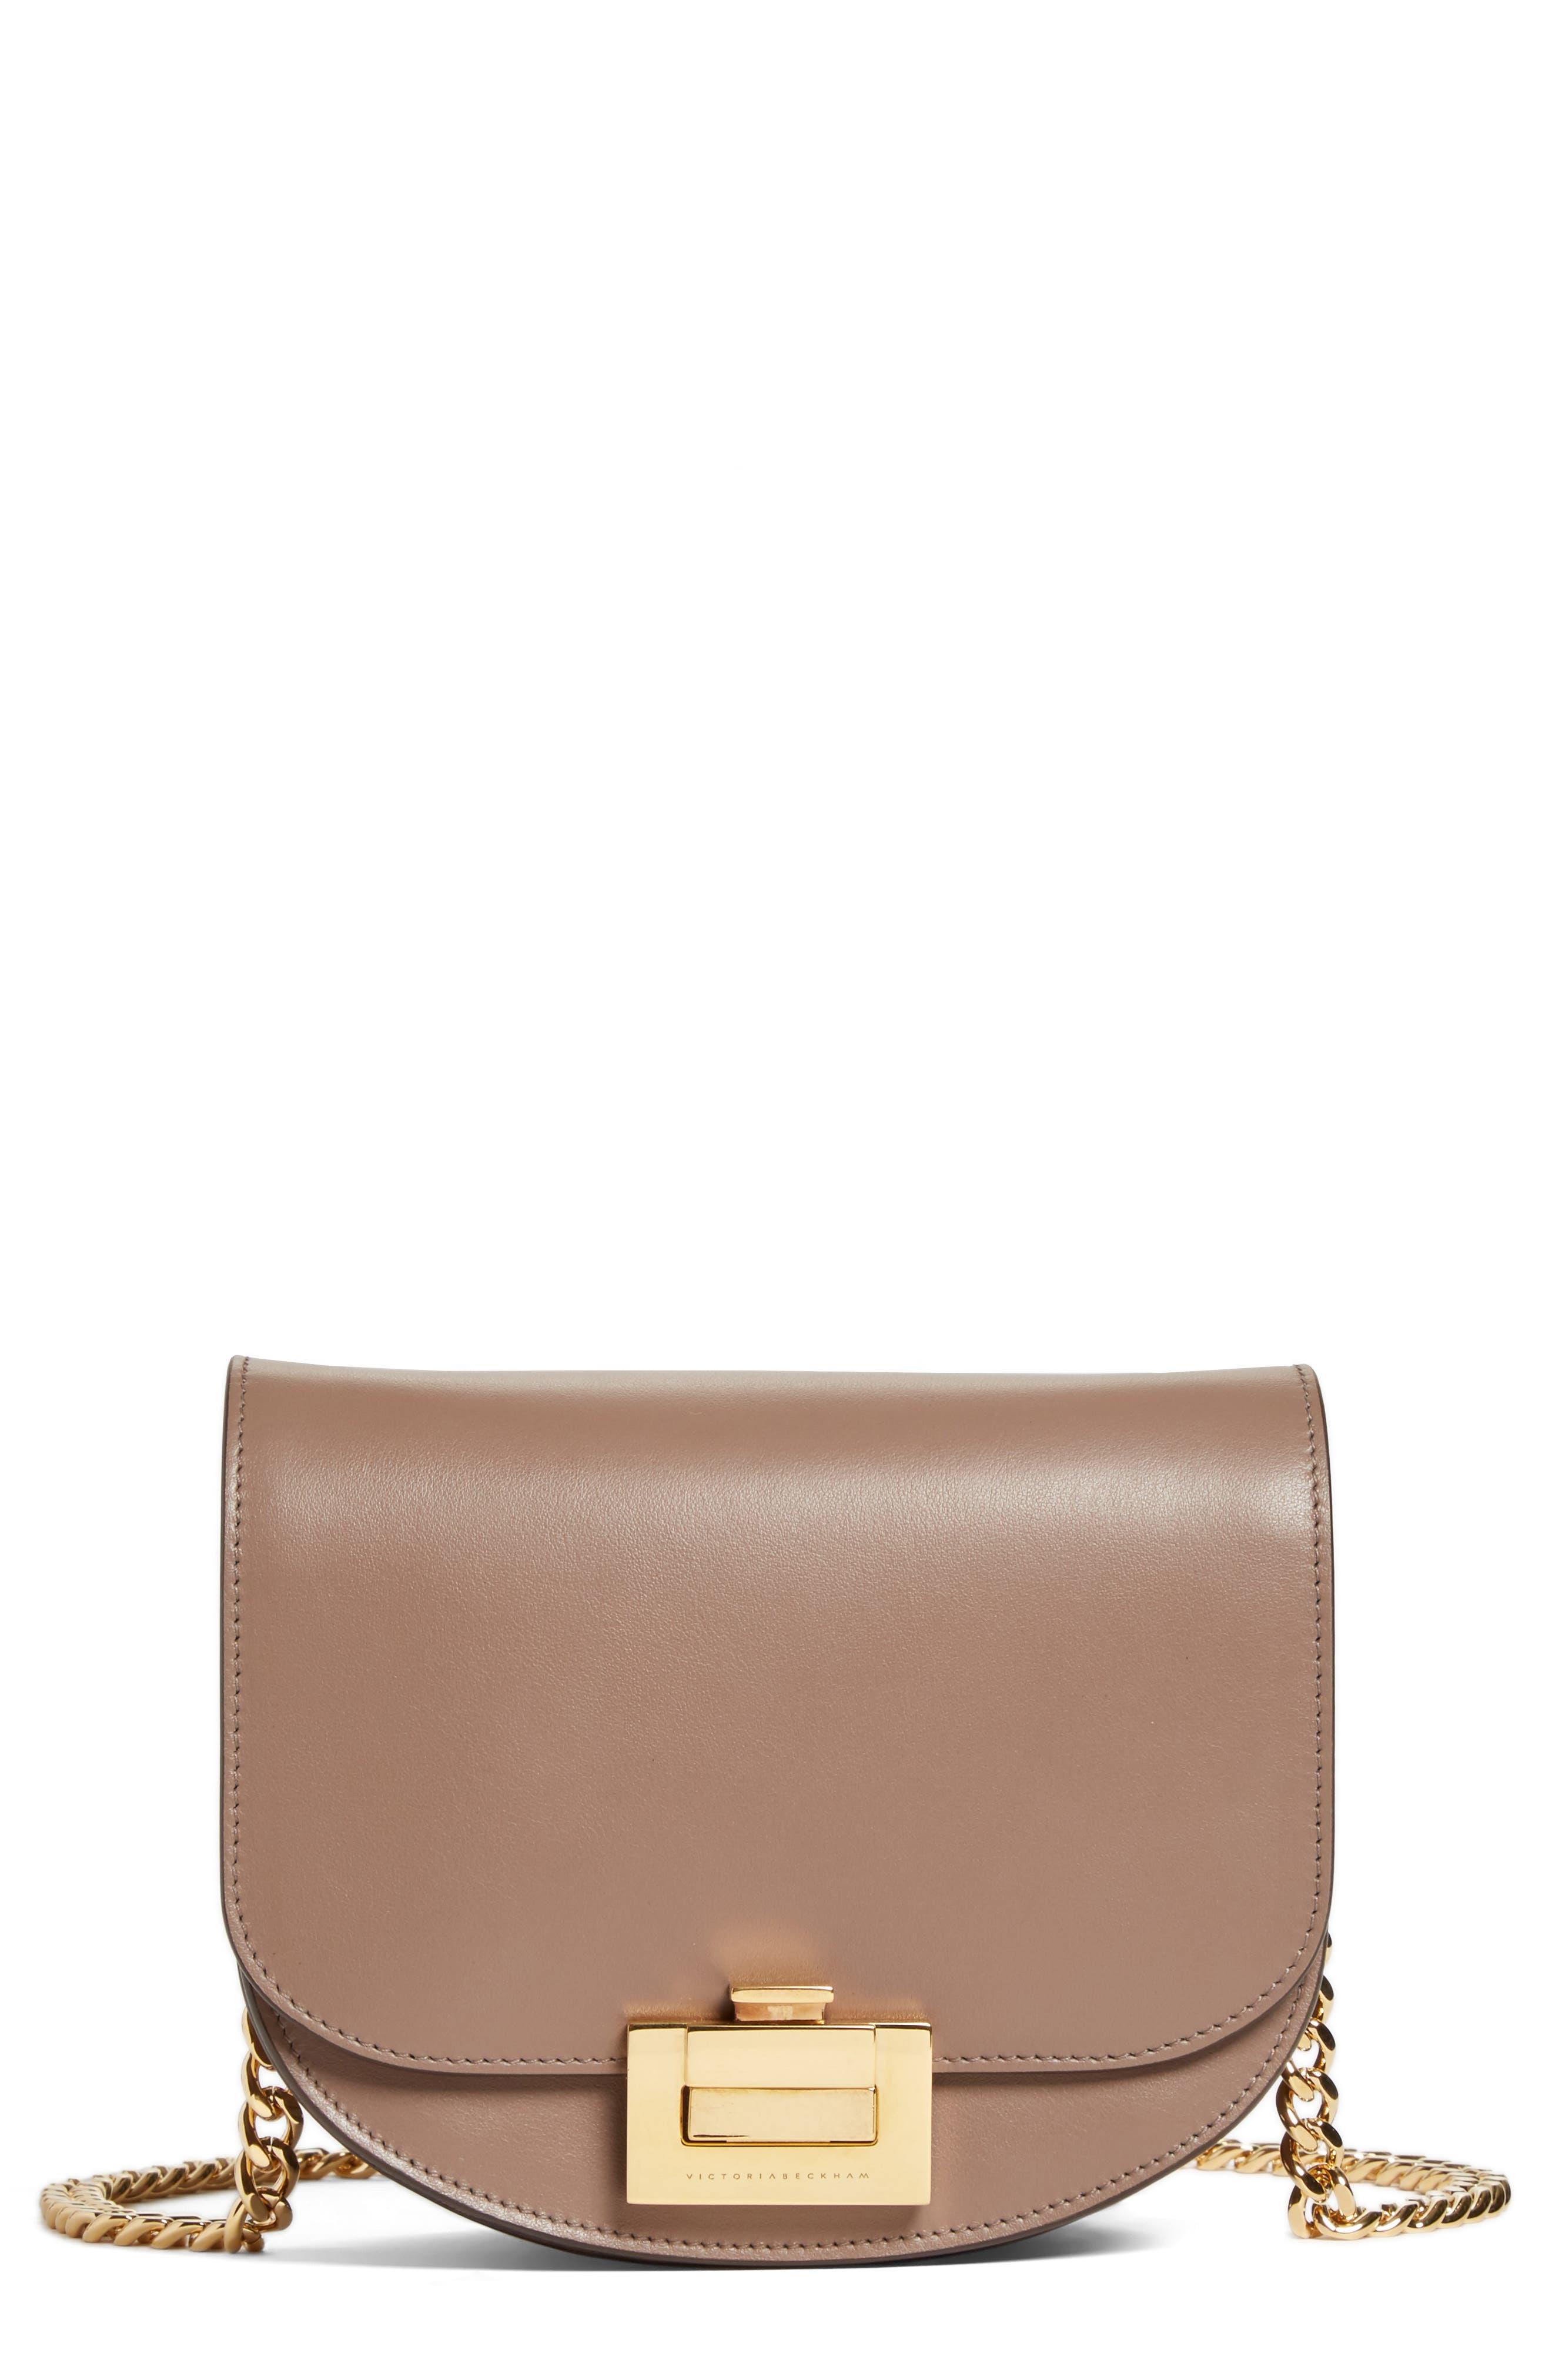 Main Image - Victoria Beckham Medium Box Leather Shoulder Bag